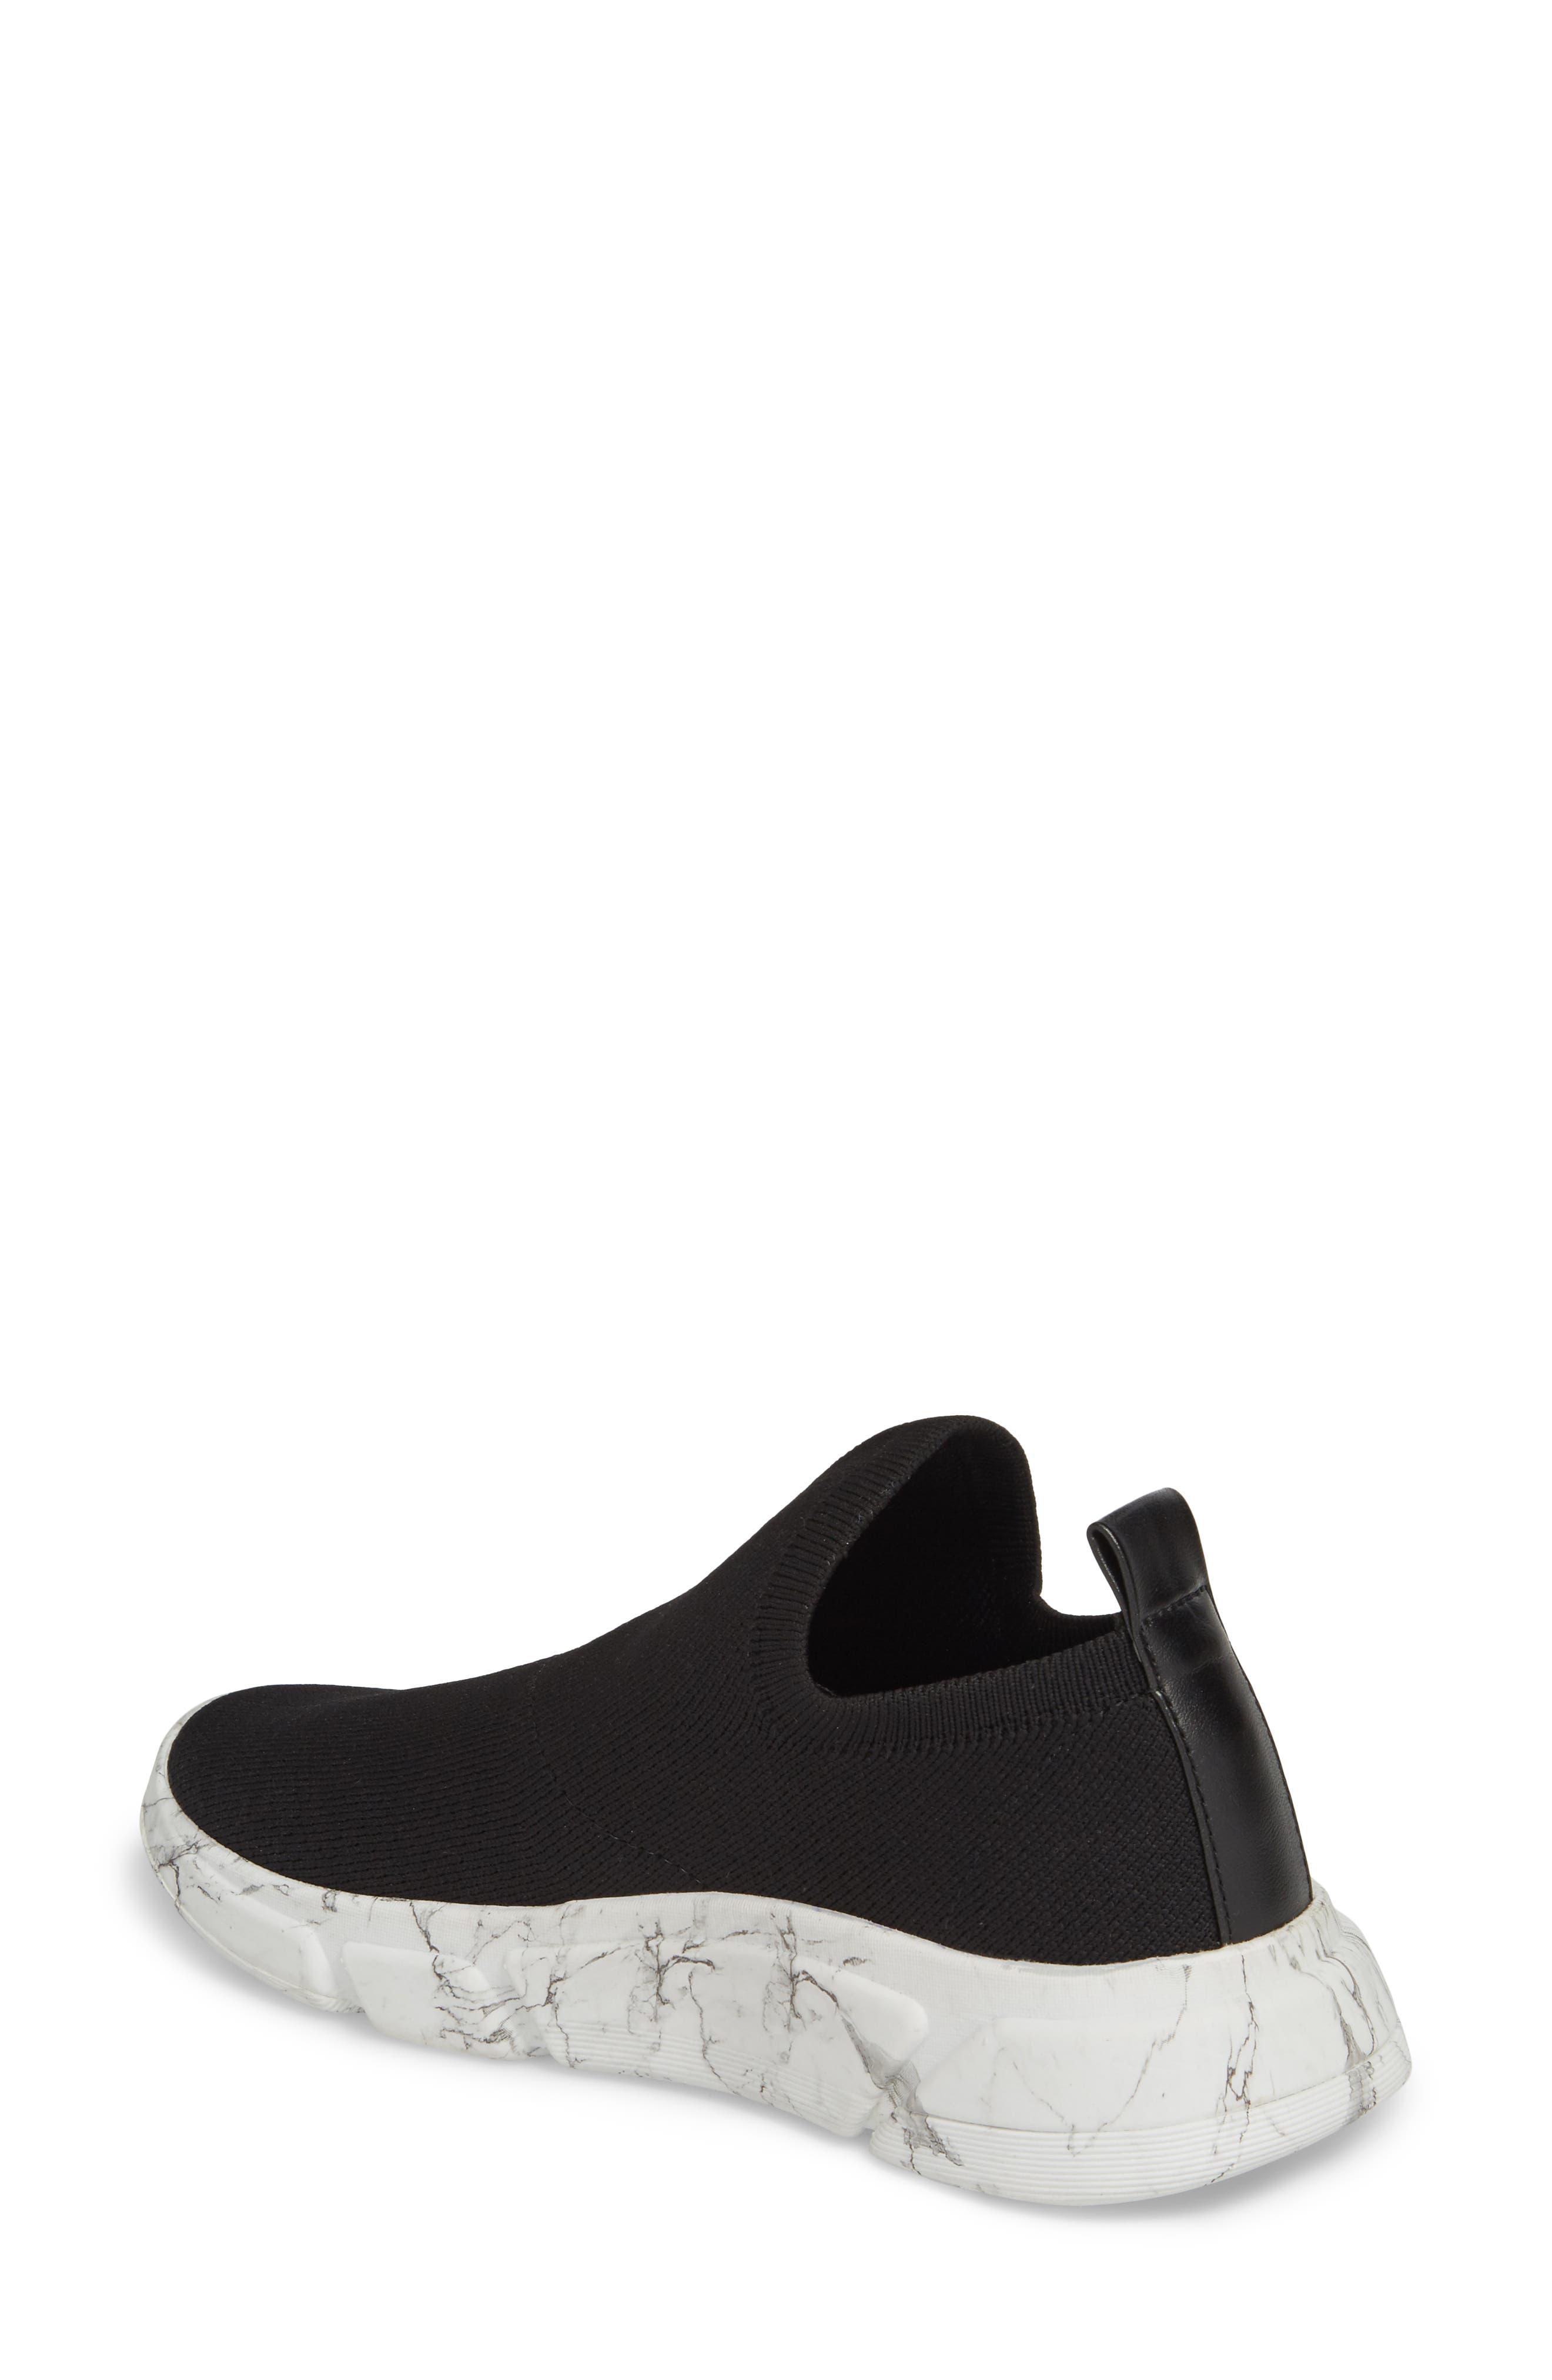 Caleb Knit Sneaker,                             Alternate thumbnail 2, color,                             BLACK